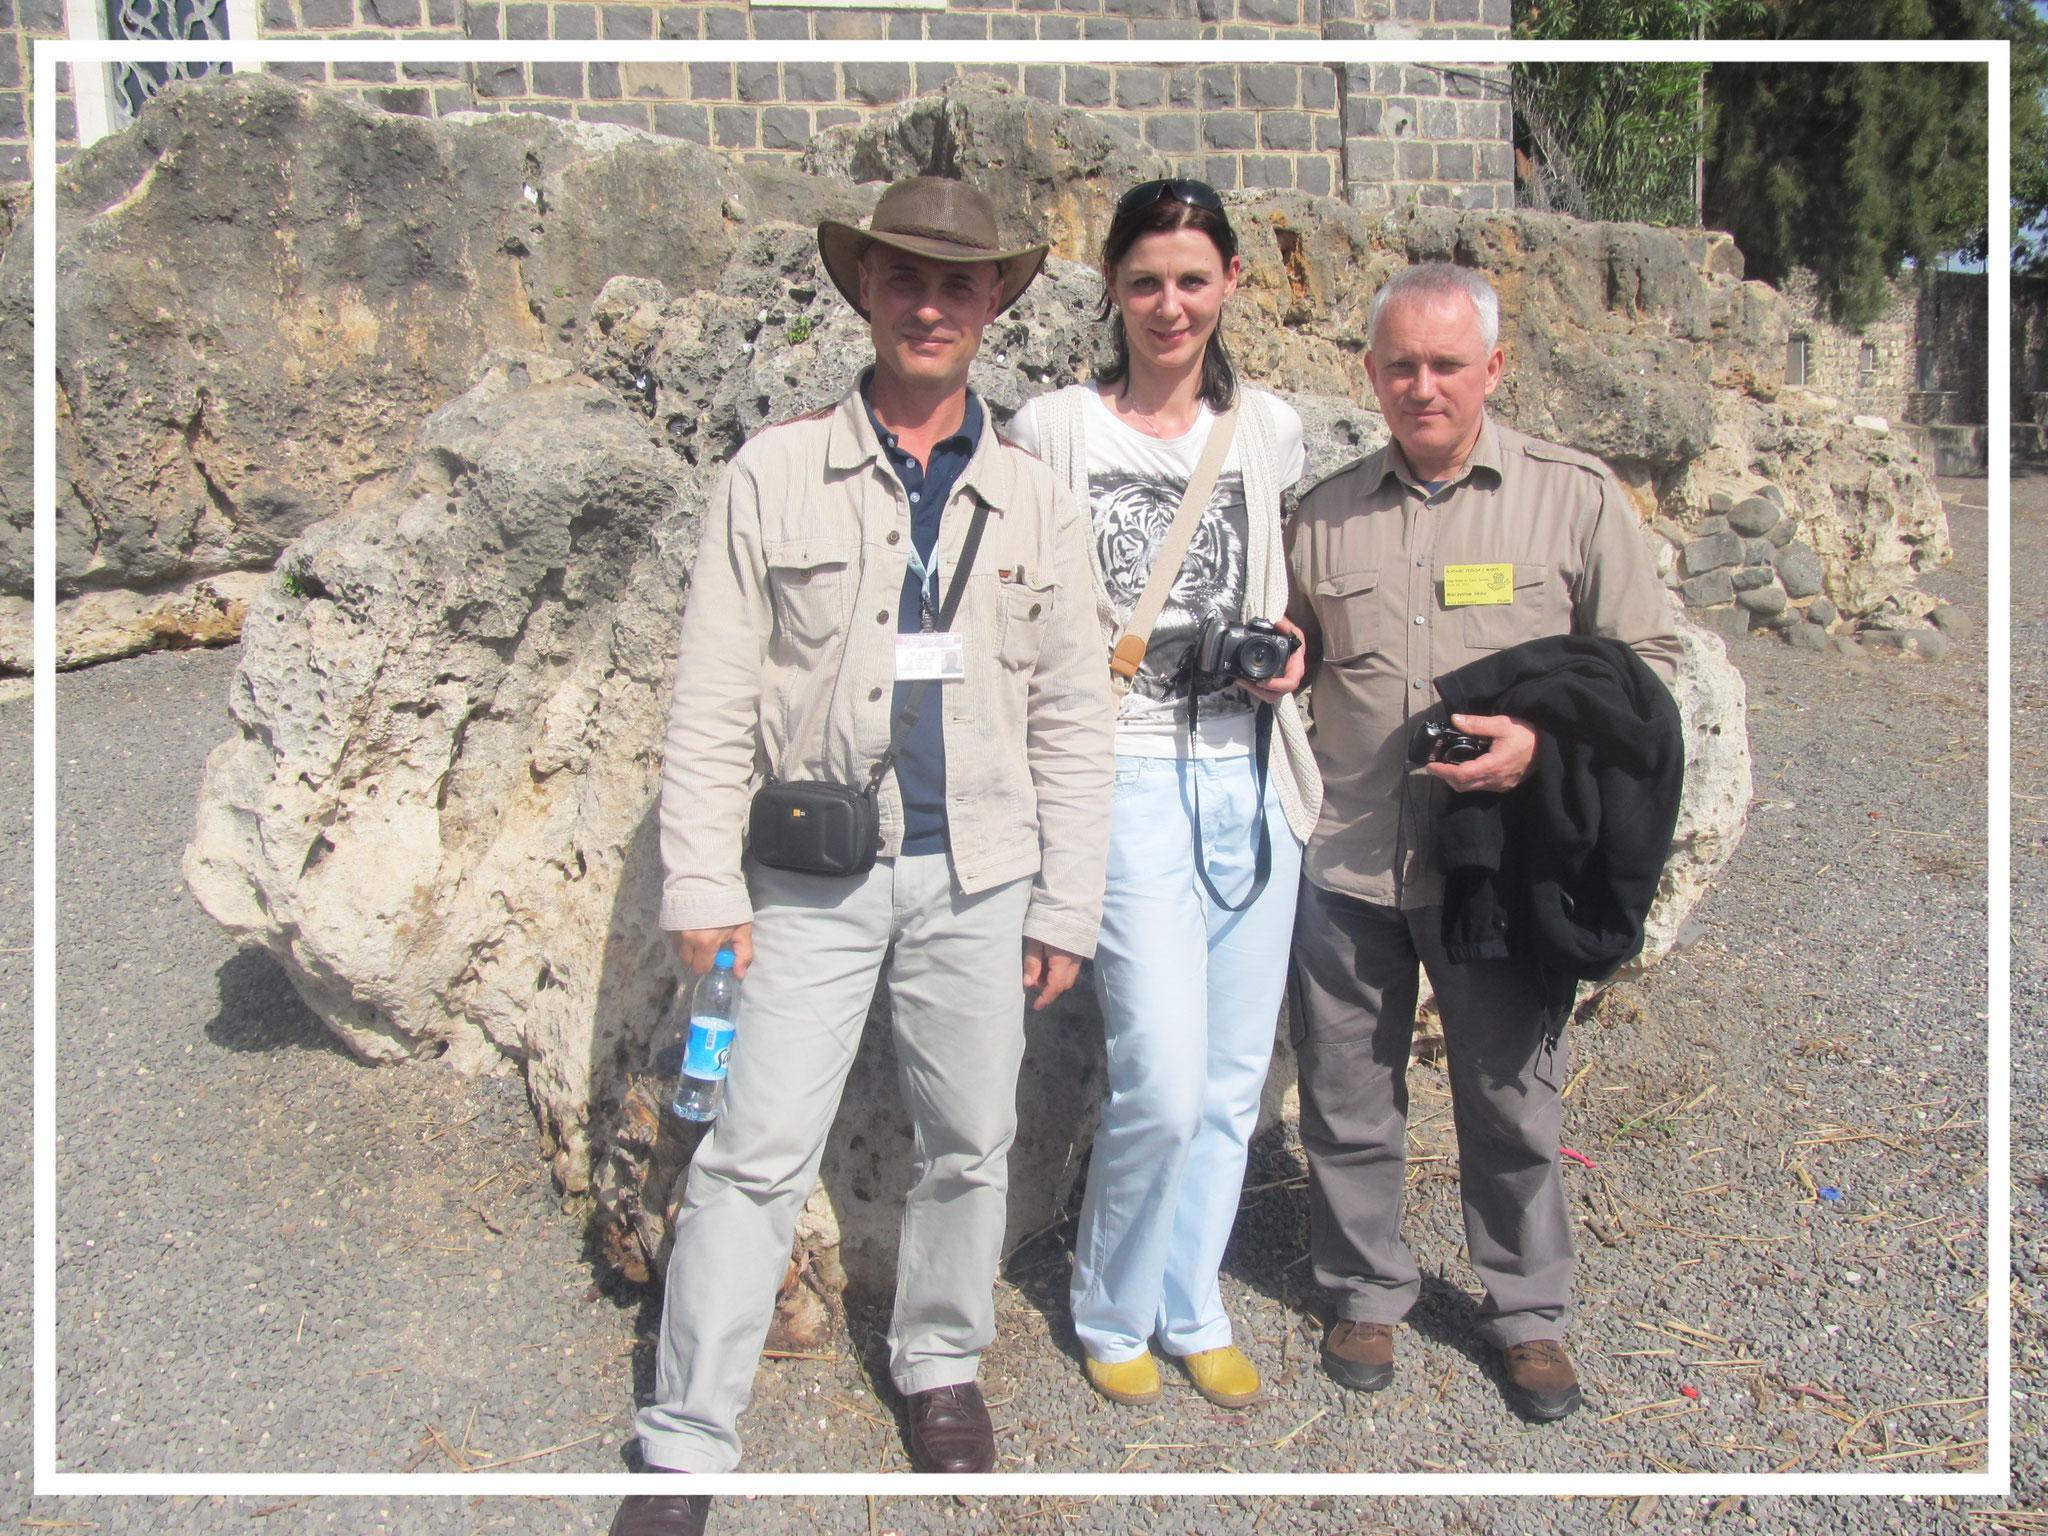 With the Polish tourists, 2011